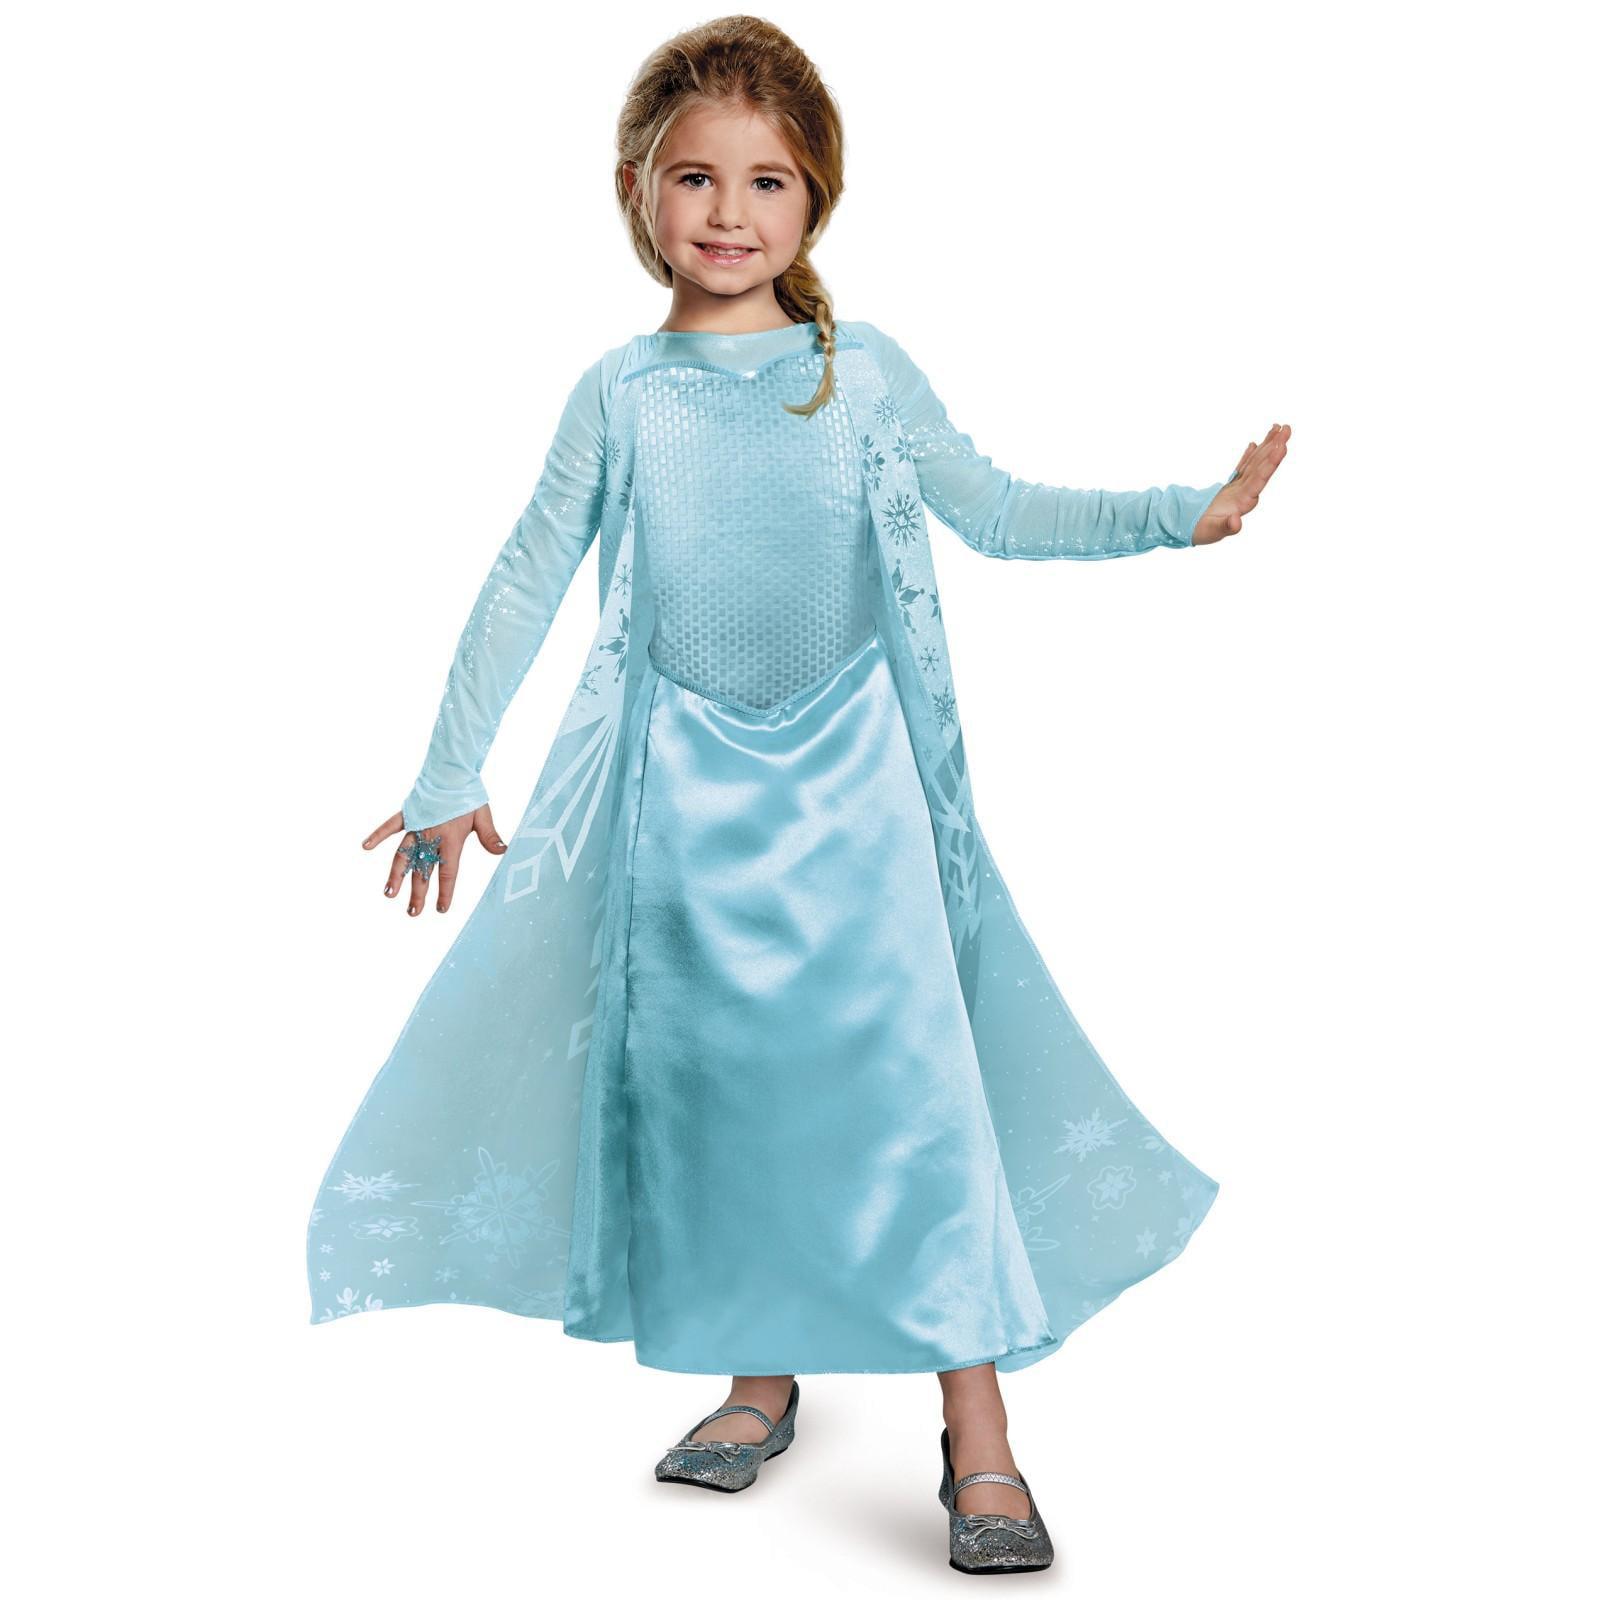 Frozen Elsa Sparkle Deluxe Toddler Costume